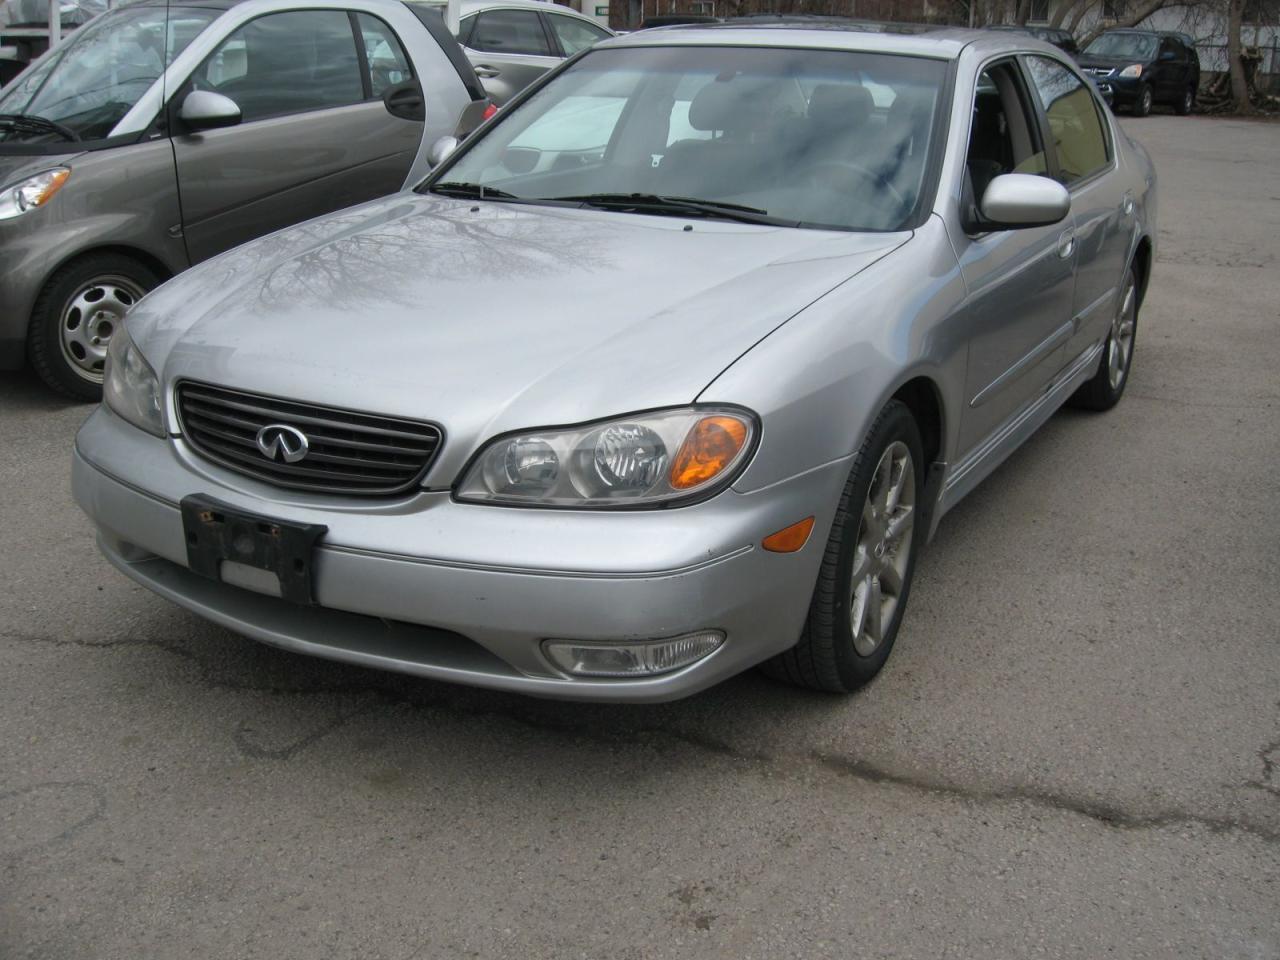 Photo of Silver 2004 Infiniti I35